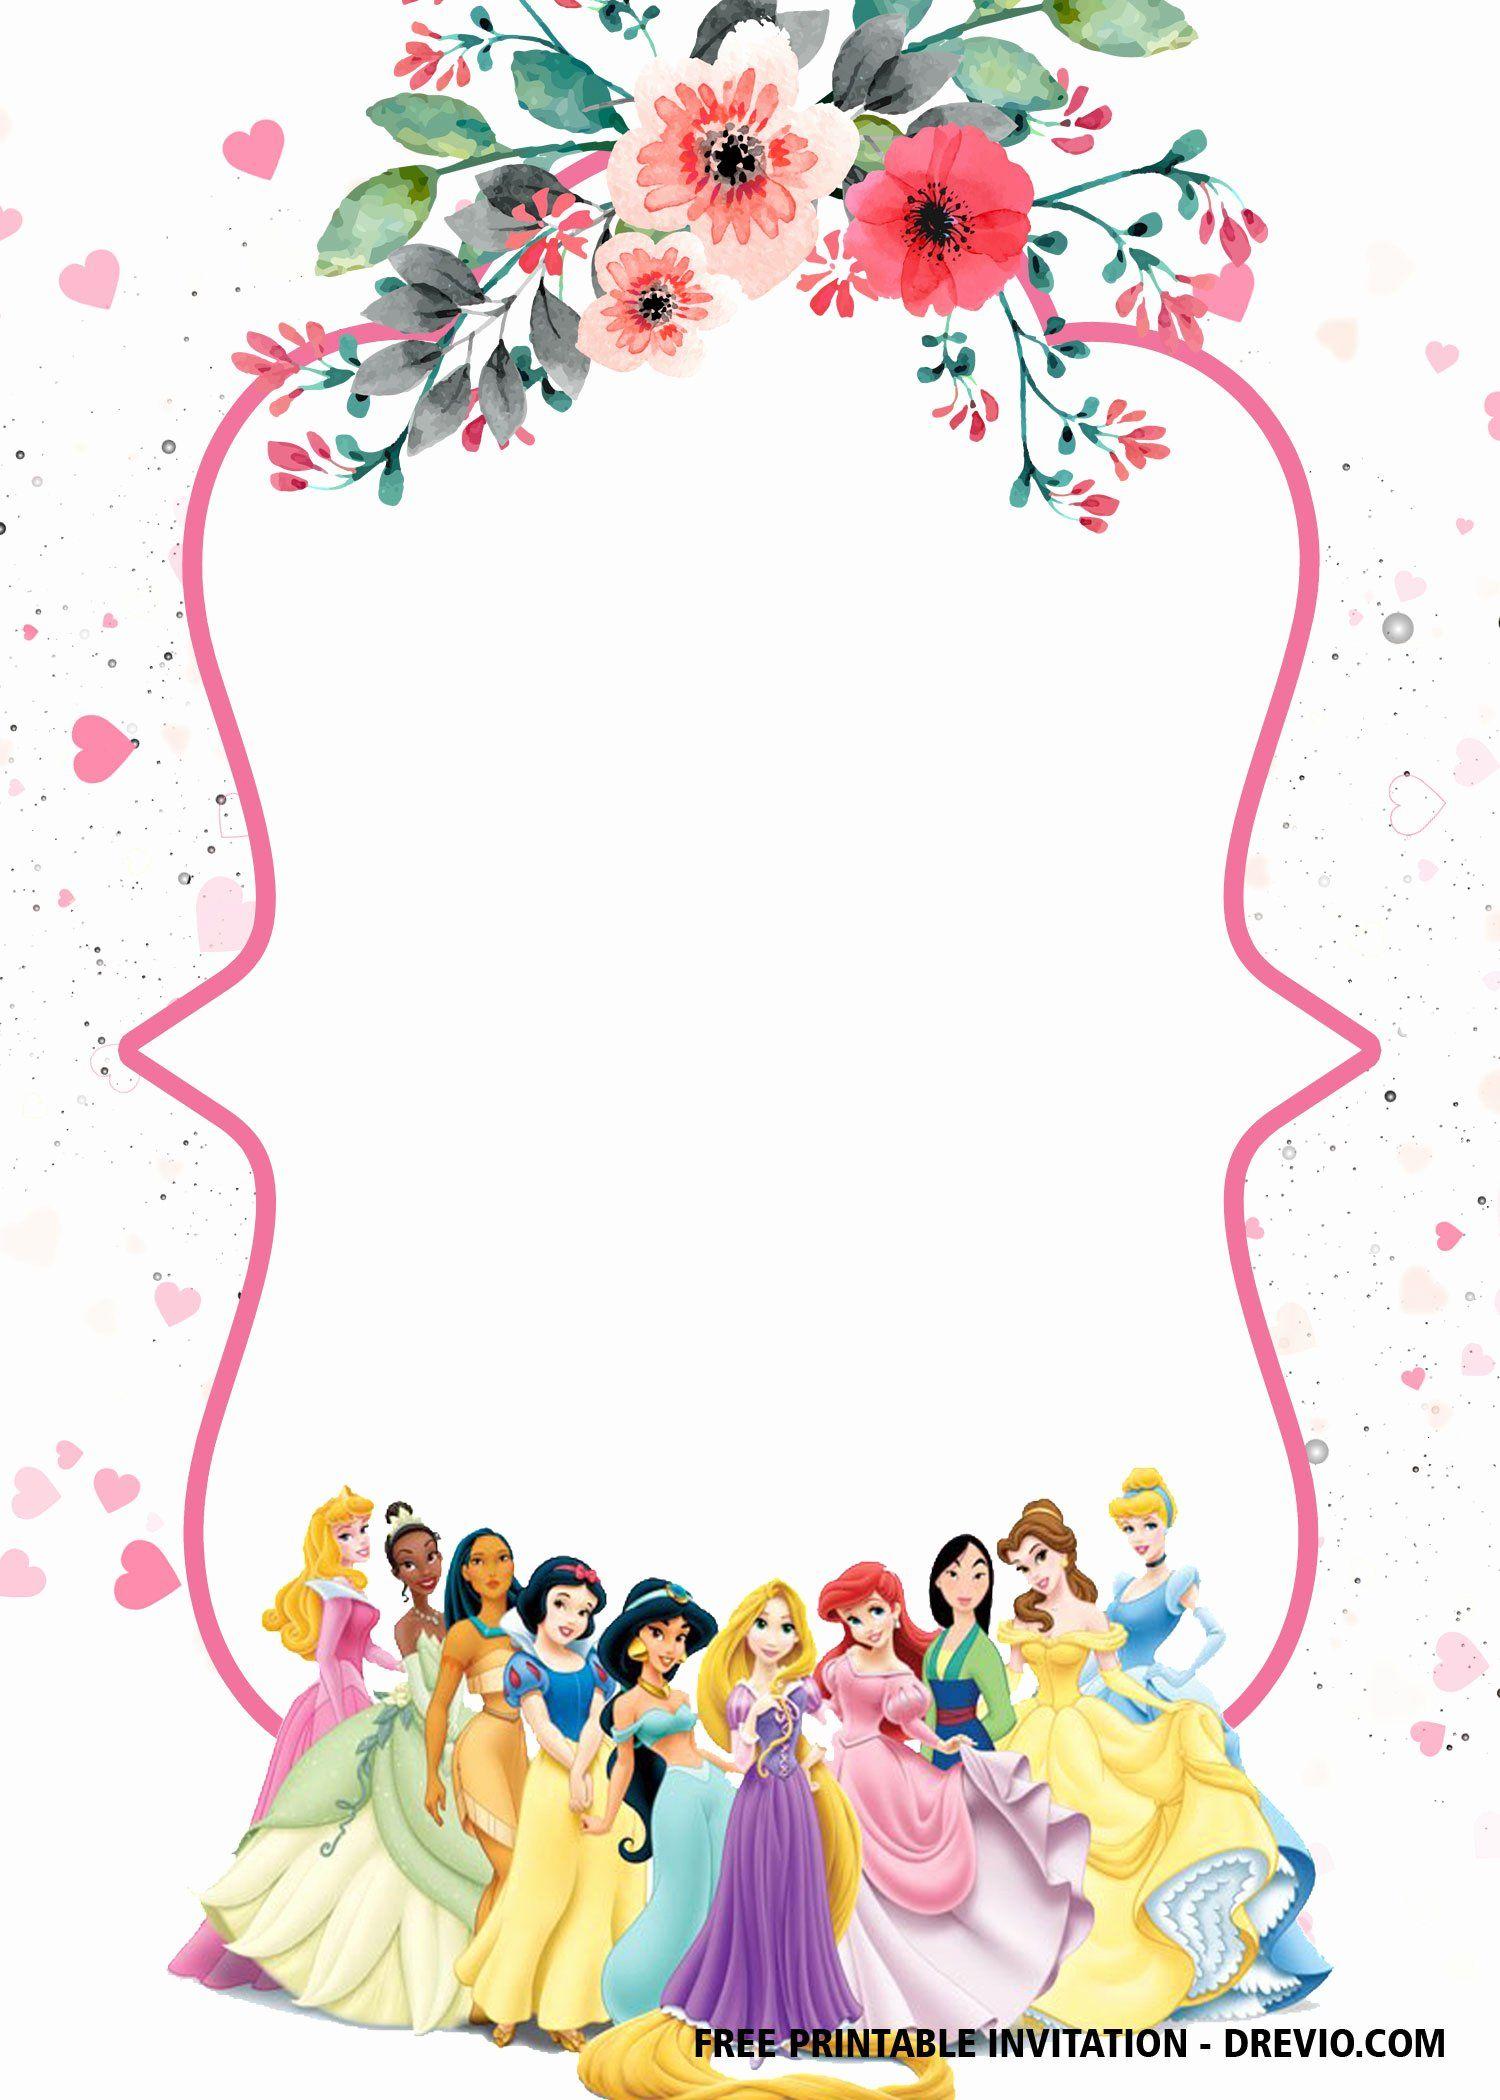 Disney Princess Invitation Templates Free Luxury Free Printable Disney Princesses In 2020 Princess Party Invitations Princess Invitations Princess Birthday Invitations